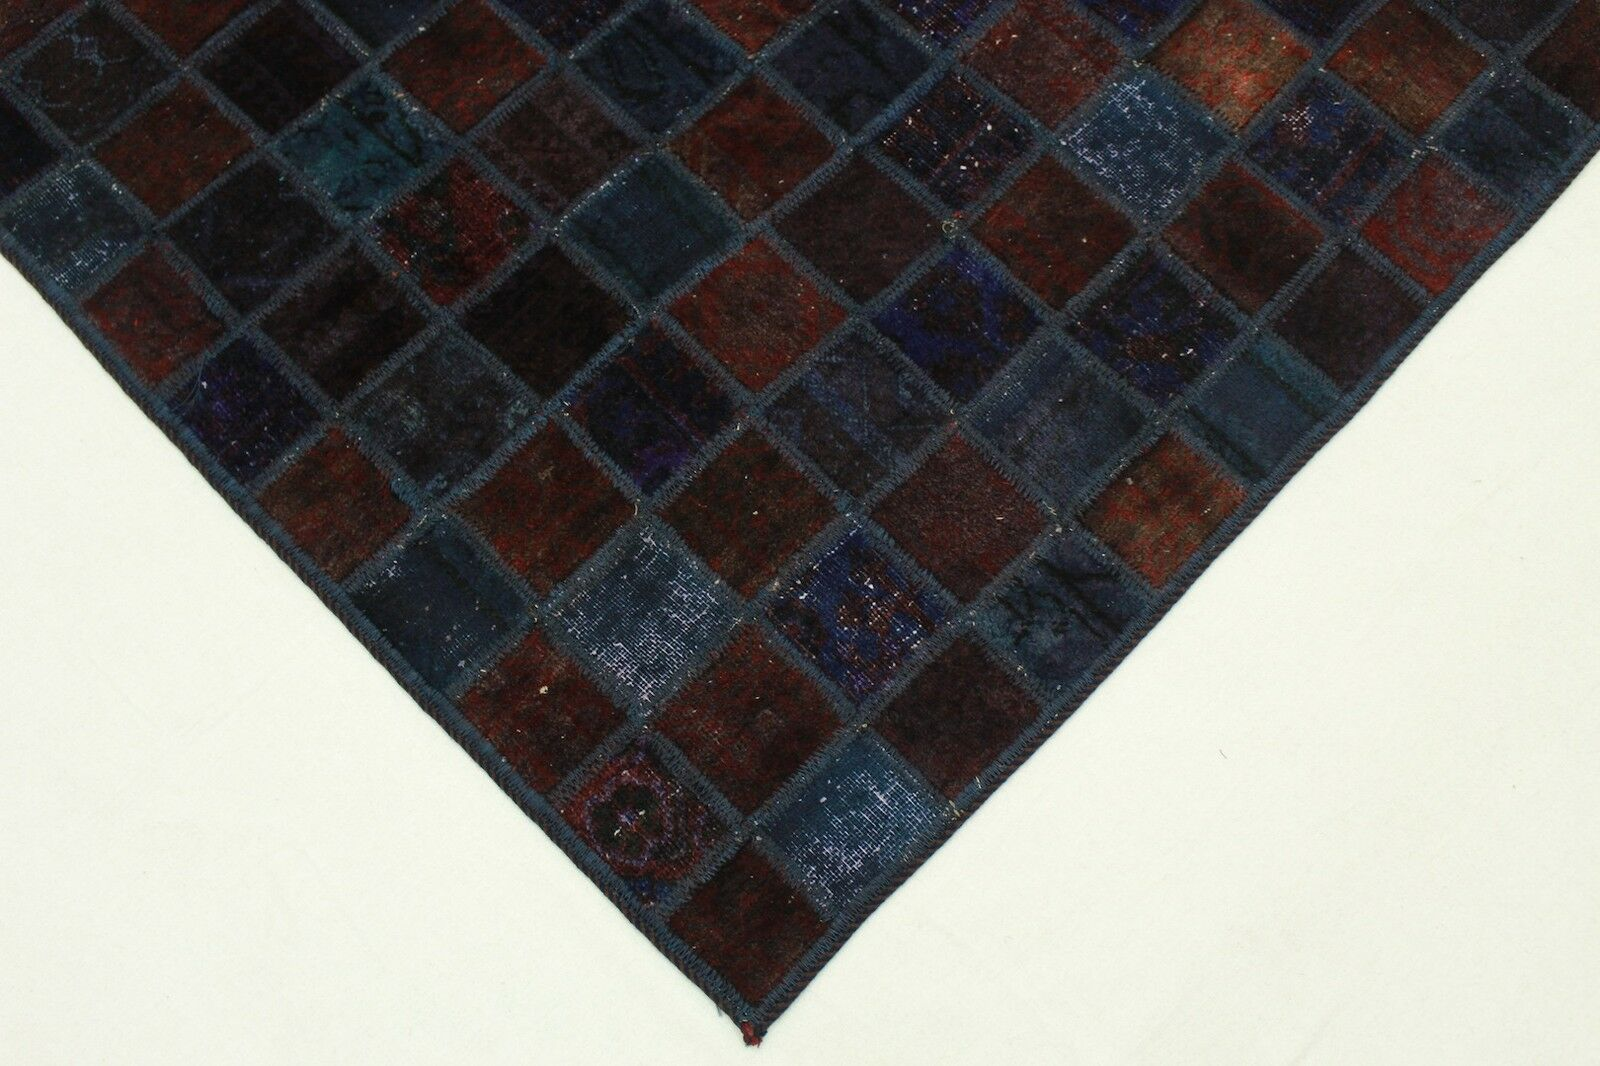 Patchwork Orient Teppich Vintage Vintage Vintage 200x140 braun rost modern Trend Used Look 2622 4ac48b